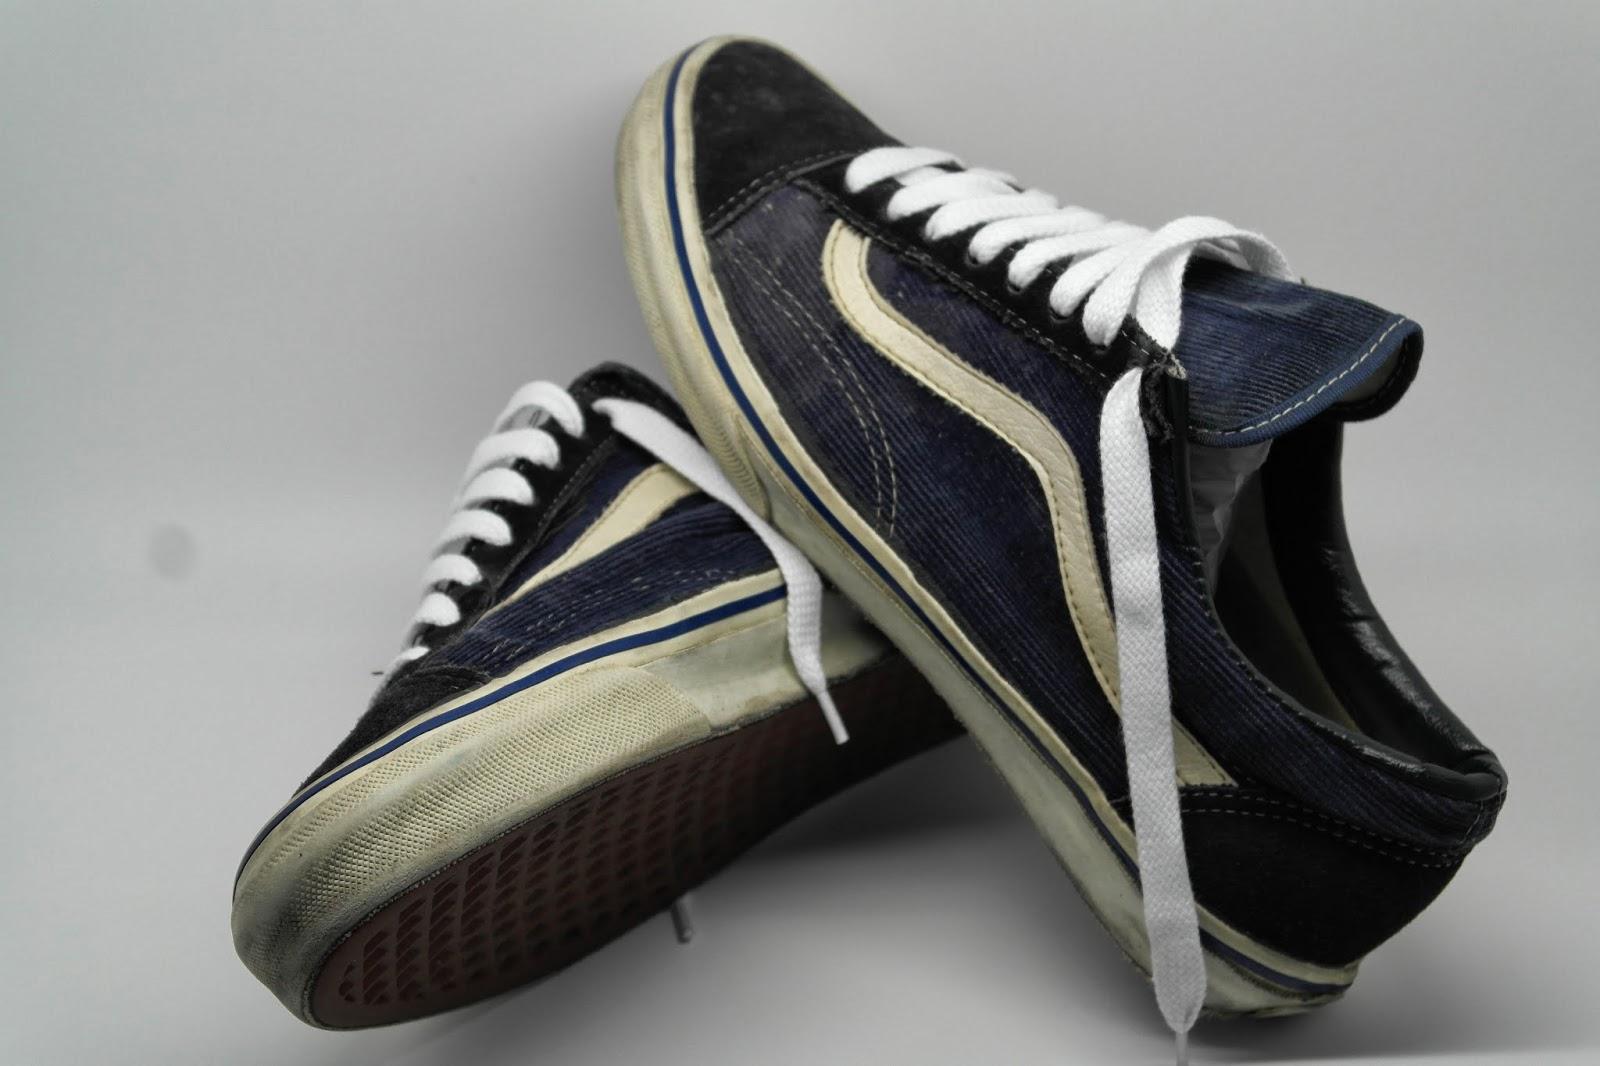 Vans Shoes Store Locator Usa